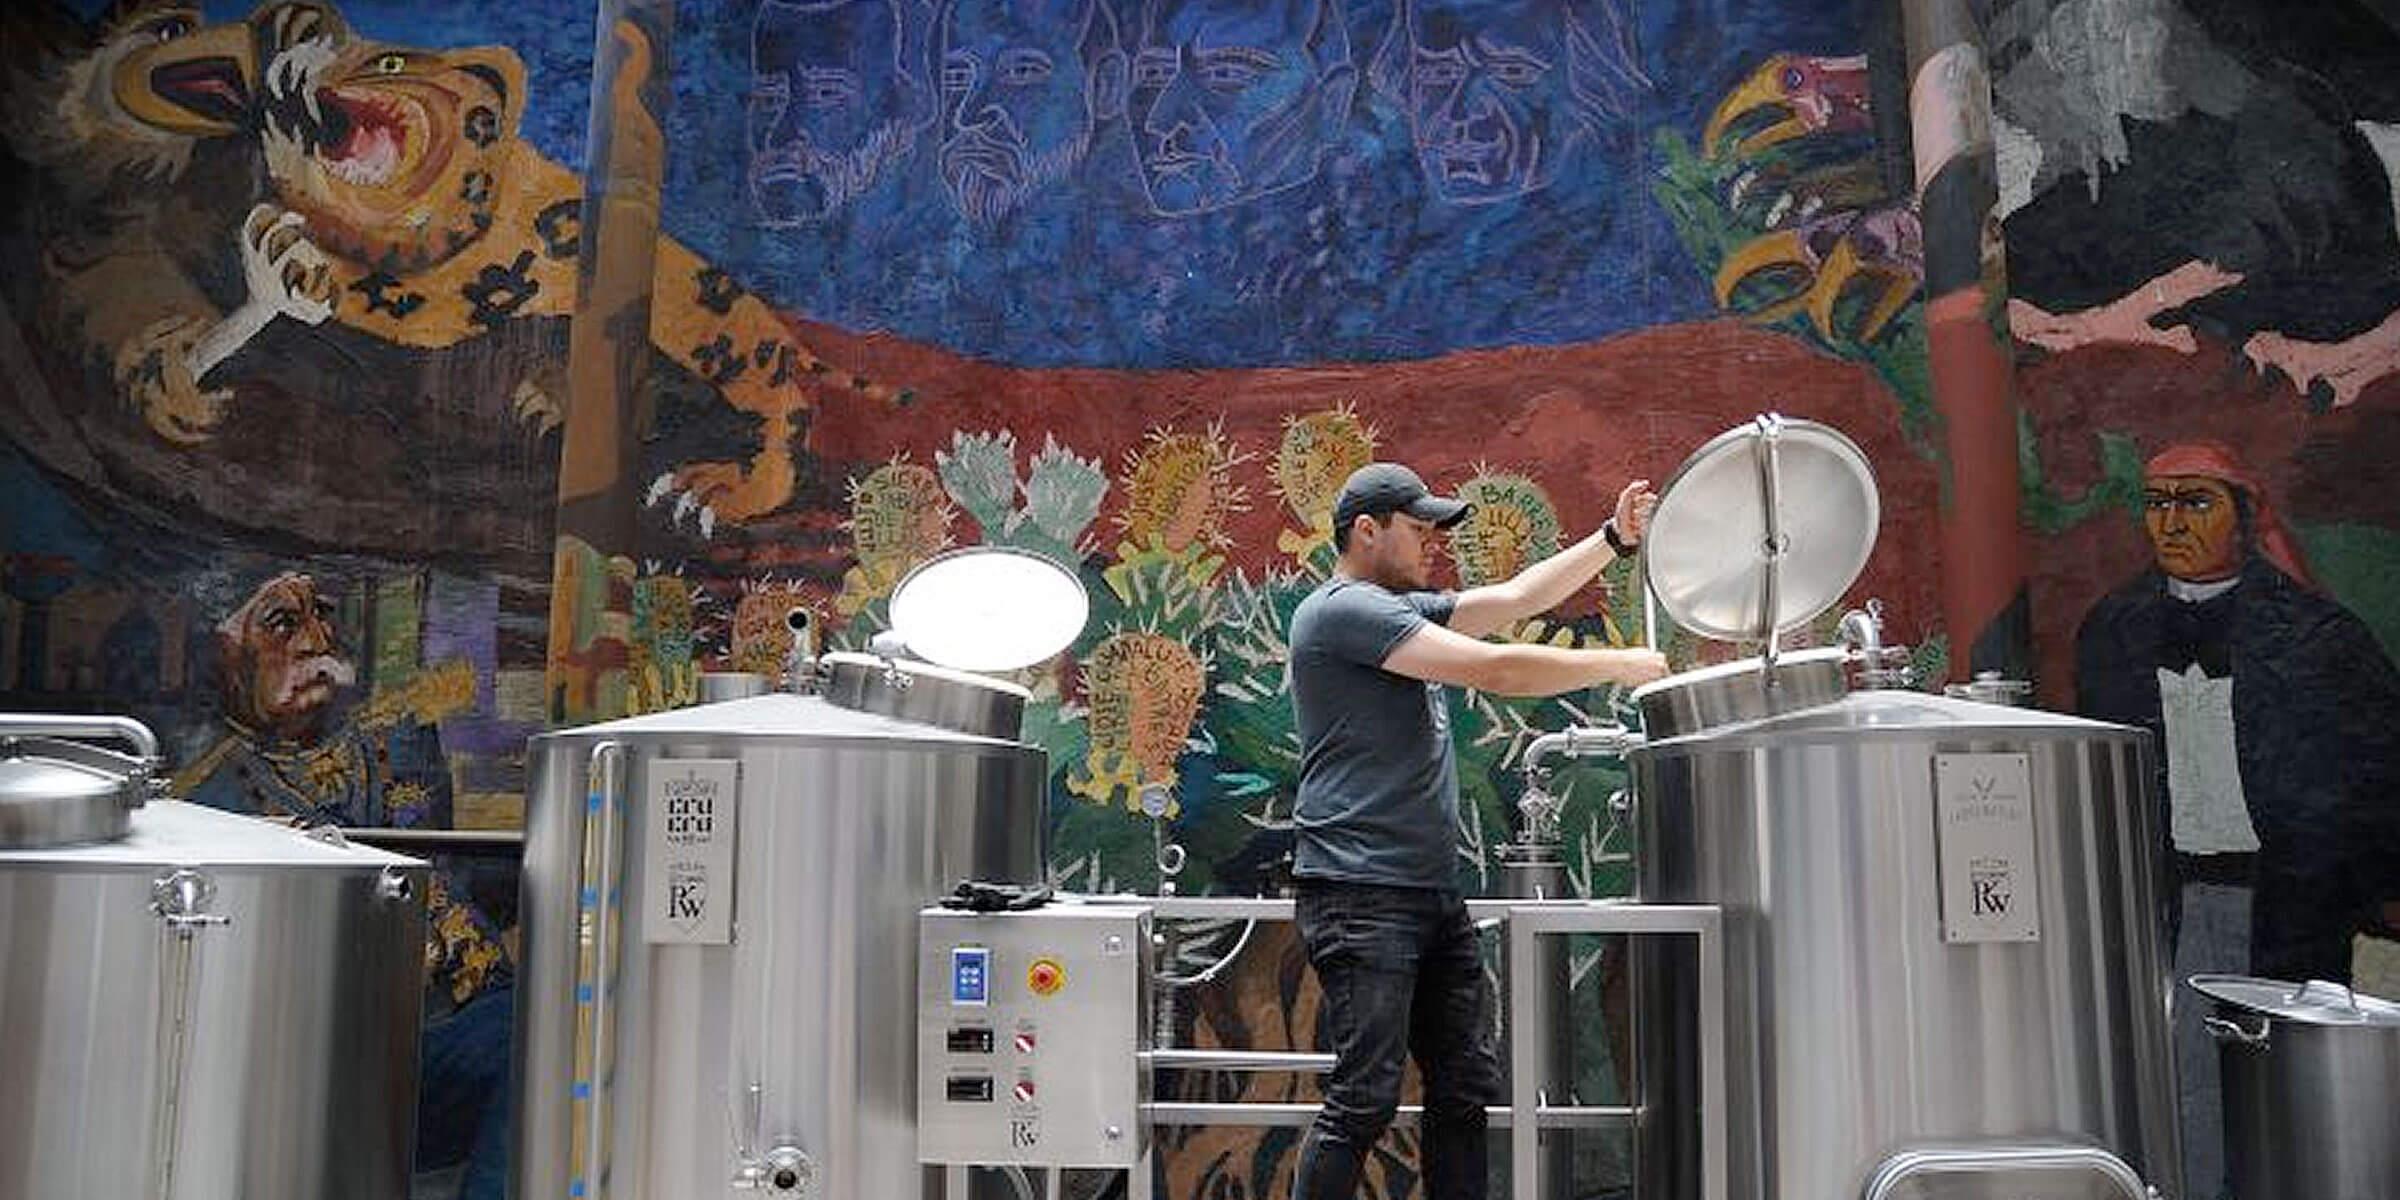 Brewer Armando from Cru Cru Brewery works at the Cru Cru Factory in Mexico City in this June 2017 photo. (Bernardo Montoya / AFP via Getty Images